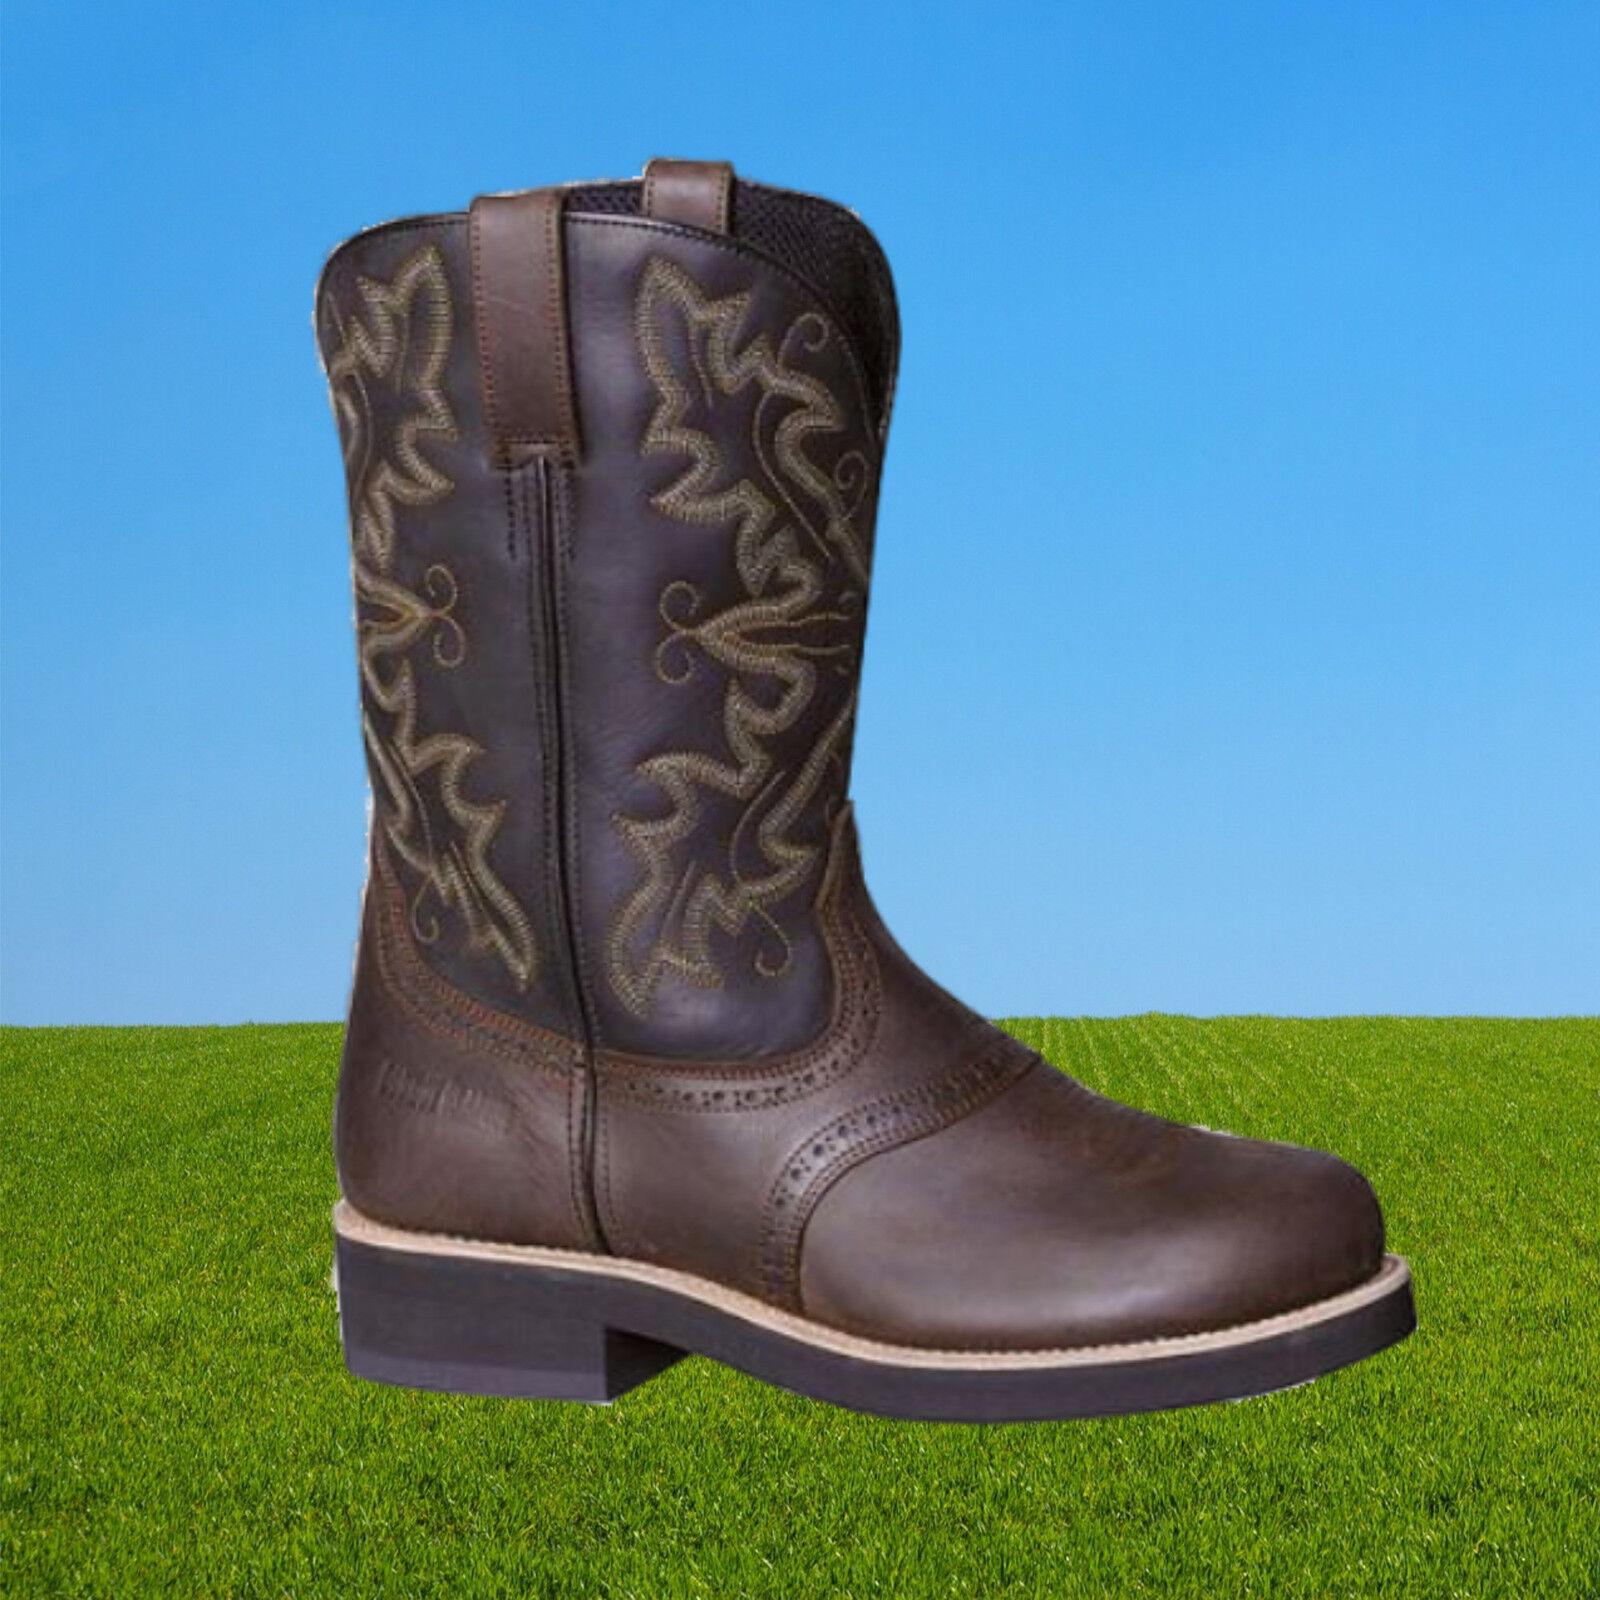 Westernstiefel C.B. Walker, Western Stiefel, WI-Western Imports, Imports, Imports, C.B. Walker  | Fuxin  | Billiger als der Preis  6ea1aa